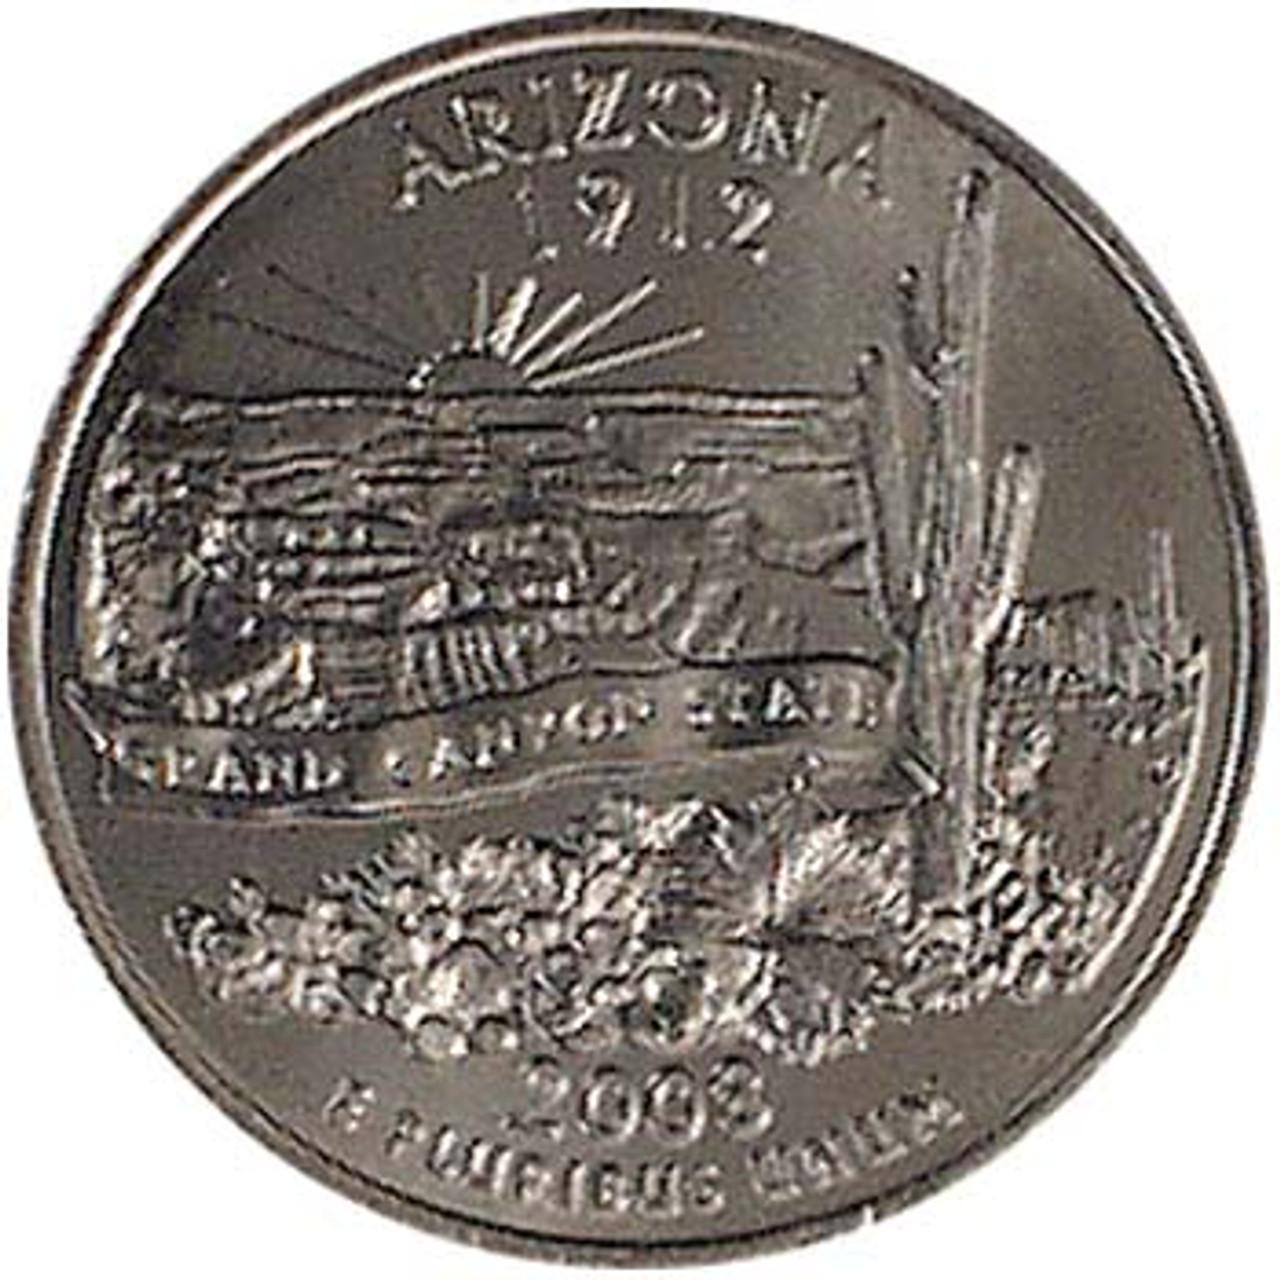 2008-D Arizona Quarter Brilliant Uncirculated Image 1